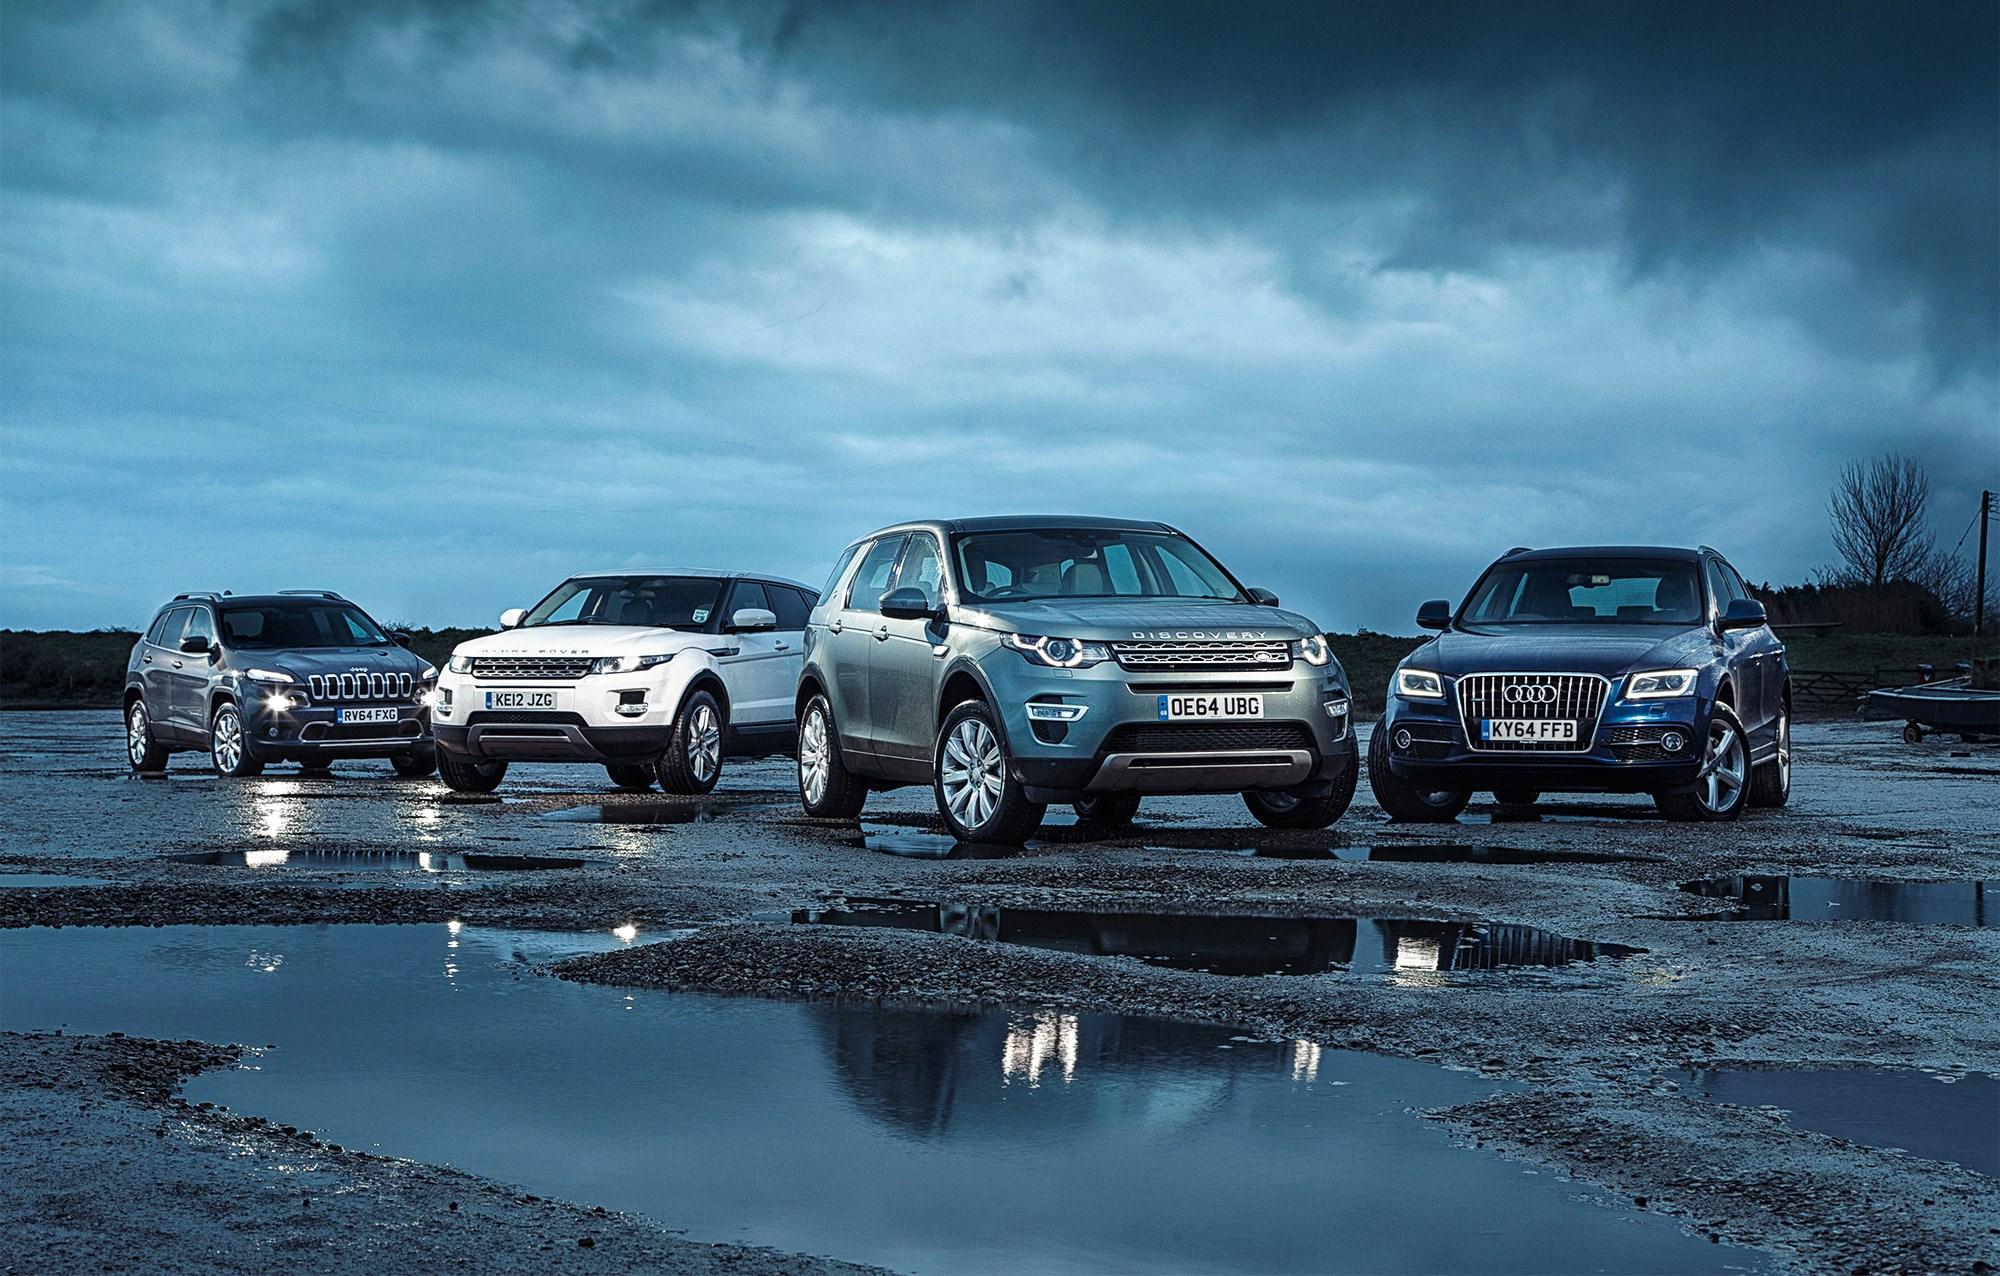 Bmw X3 Vs. Audi Q5 >> Land Rover Discovery Sport vs Audi Q5 vs Jeep Cherokee vs Range Rover Evoque (2015) group test ...